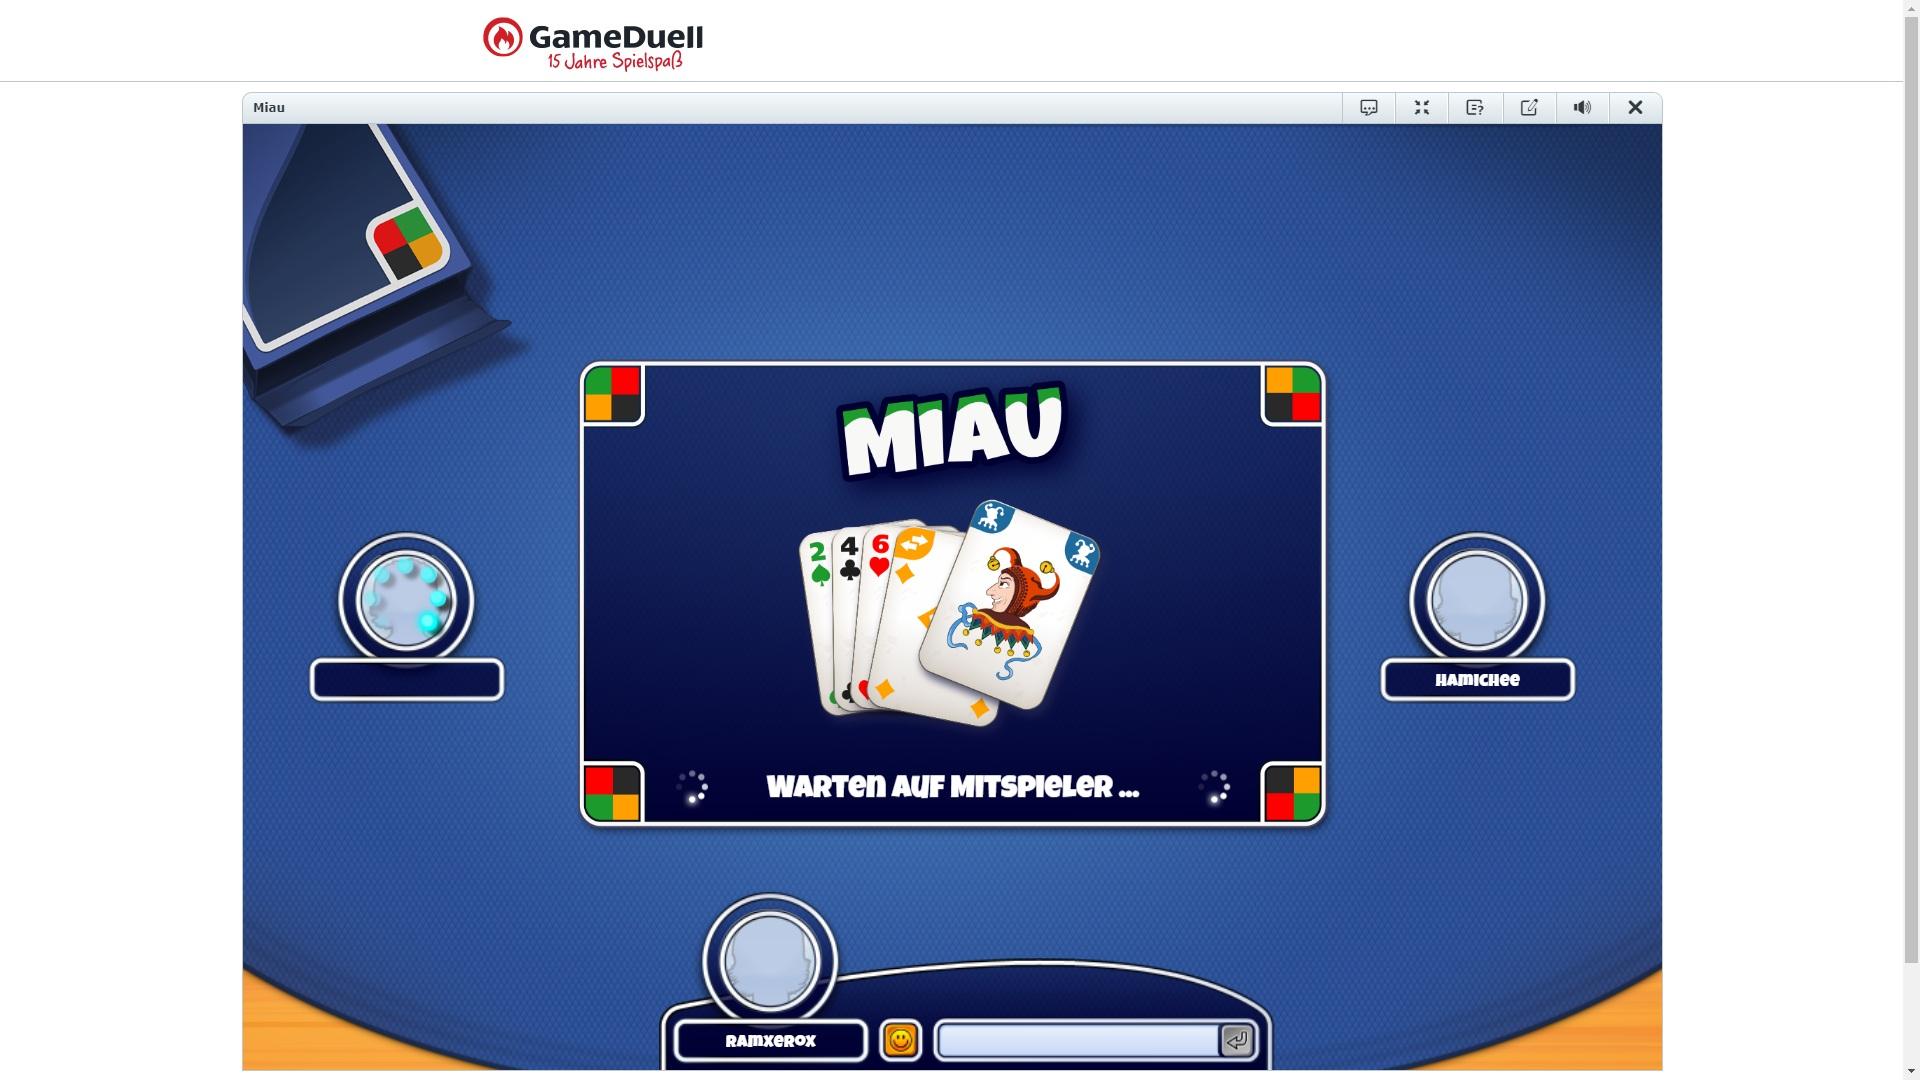 Gameduell App